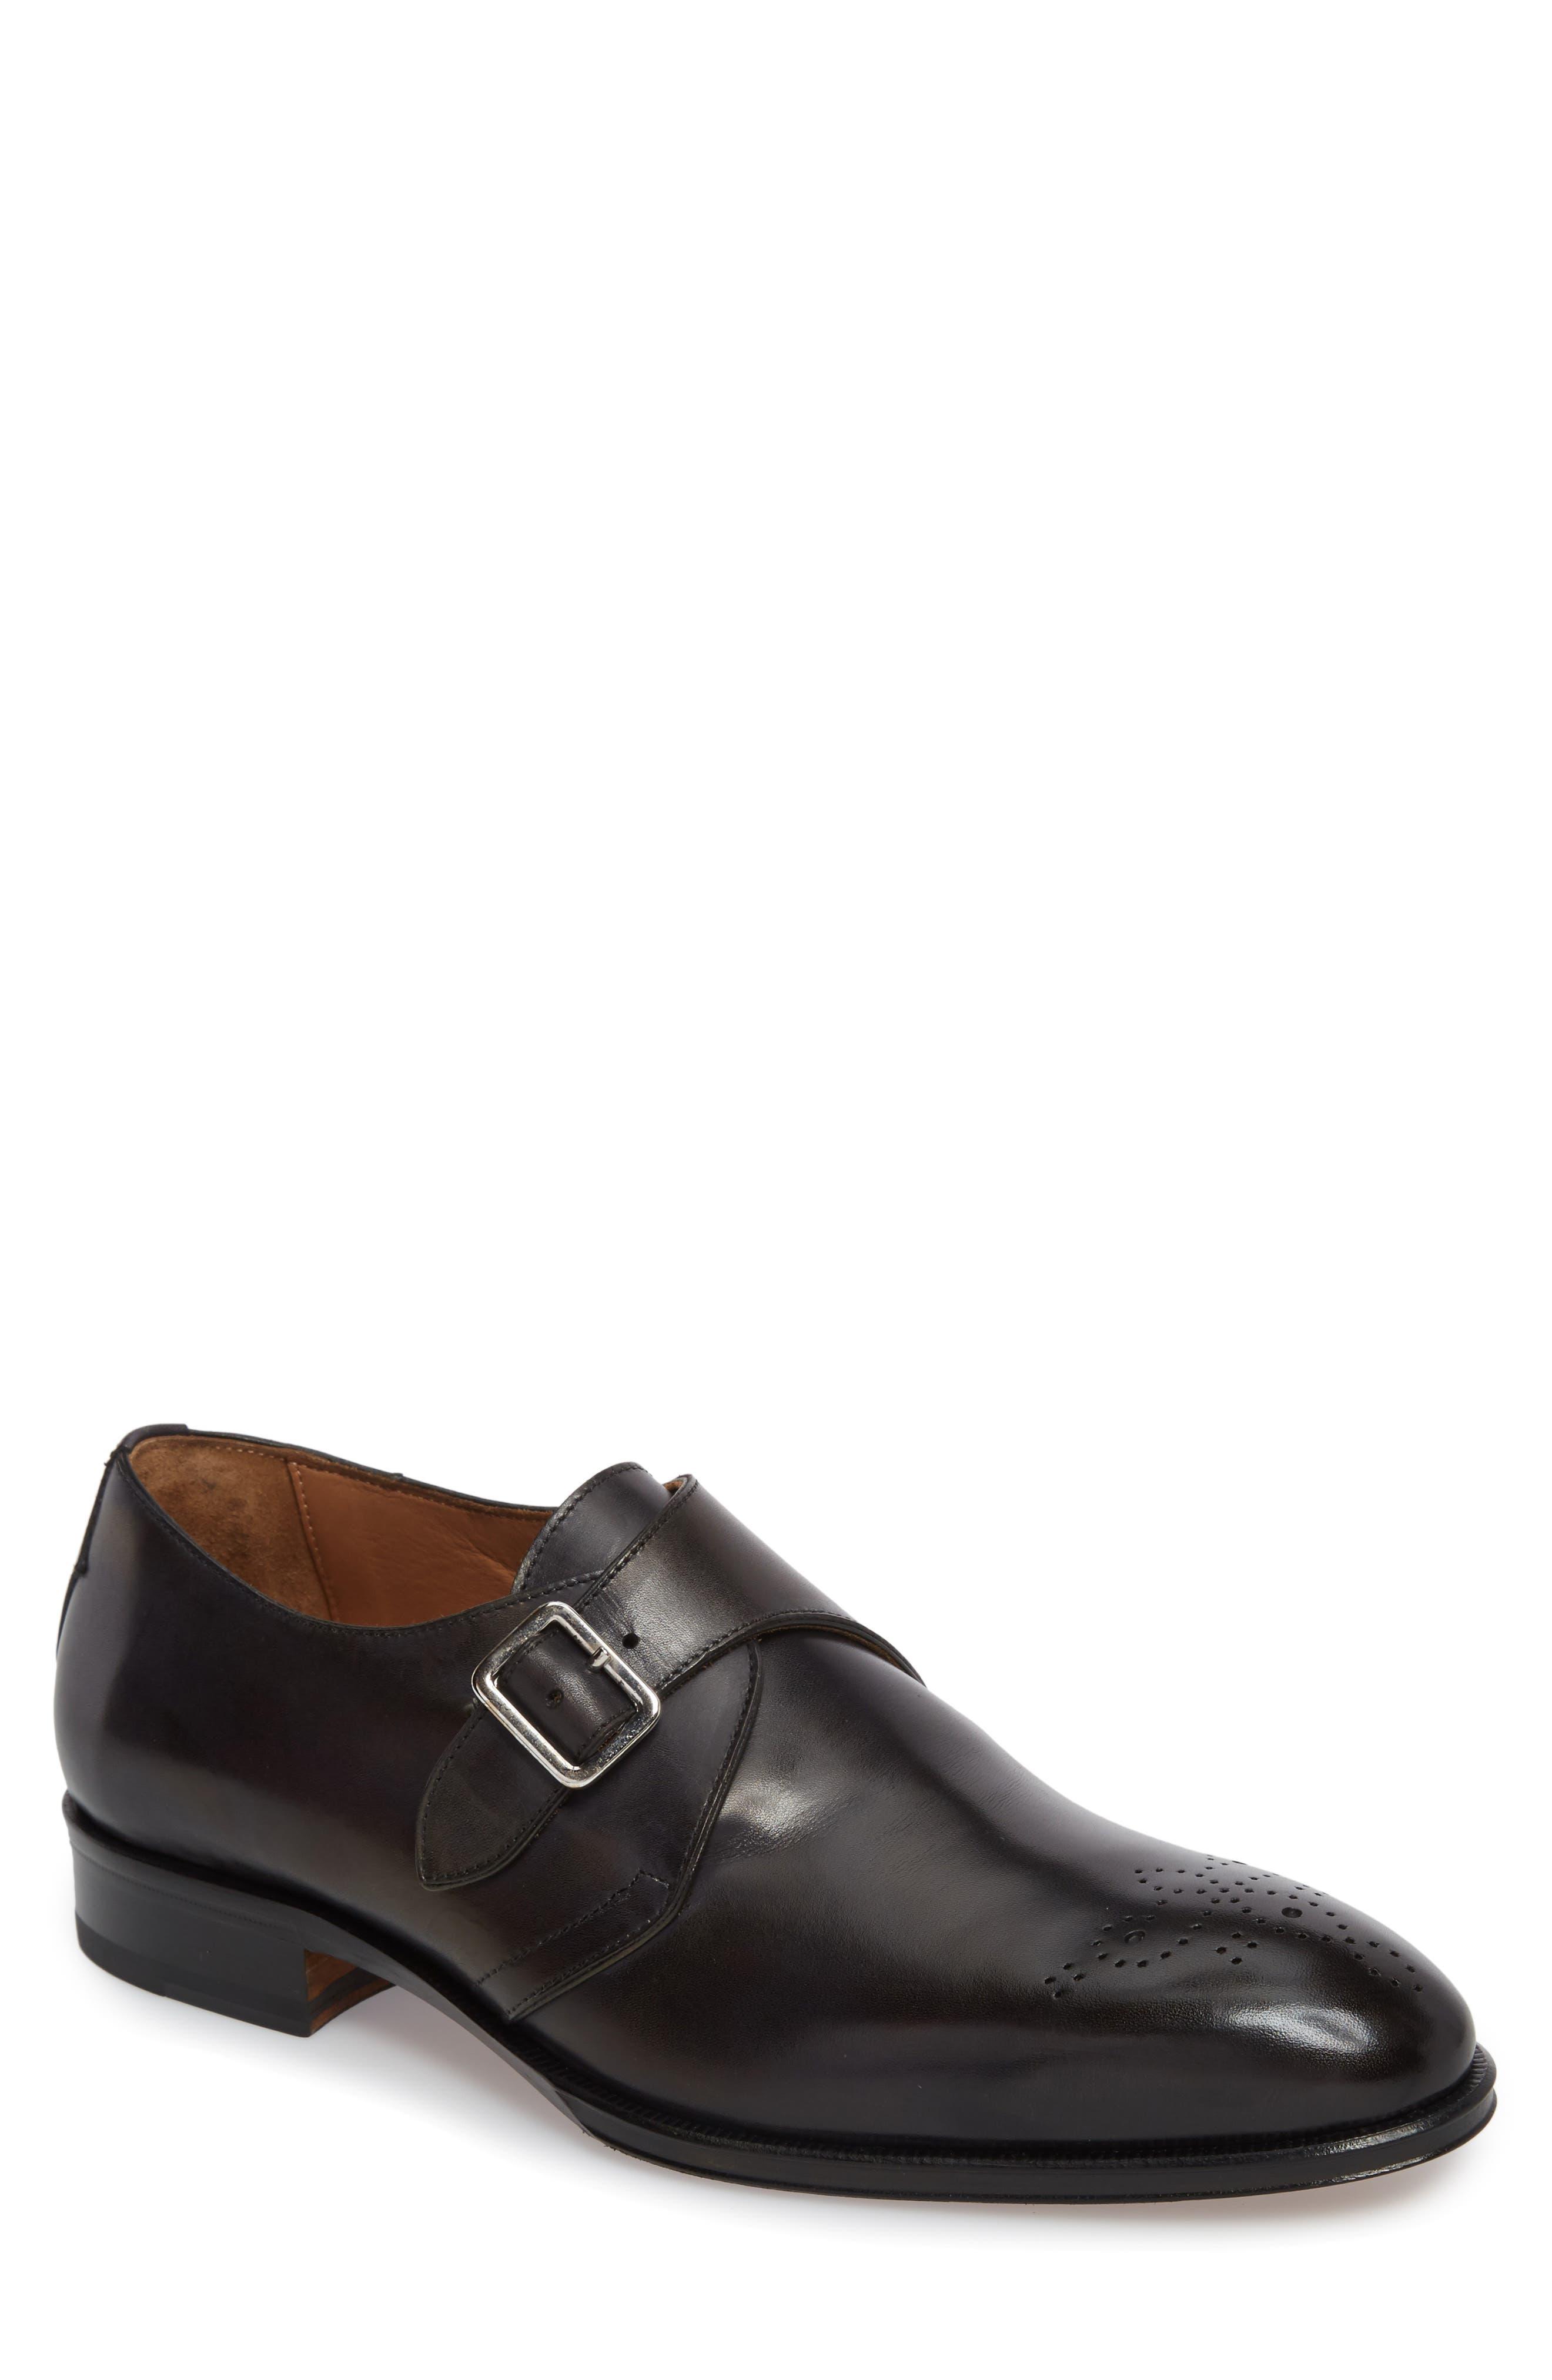 Gallo Bianco Bologna Monk Strap Shoe,                             Main thumbnail 1, color,                             Anthracite